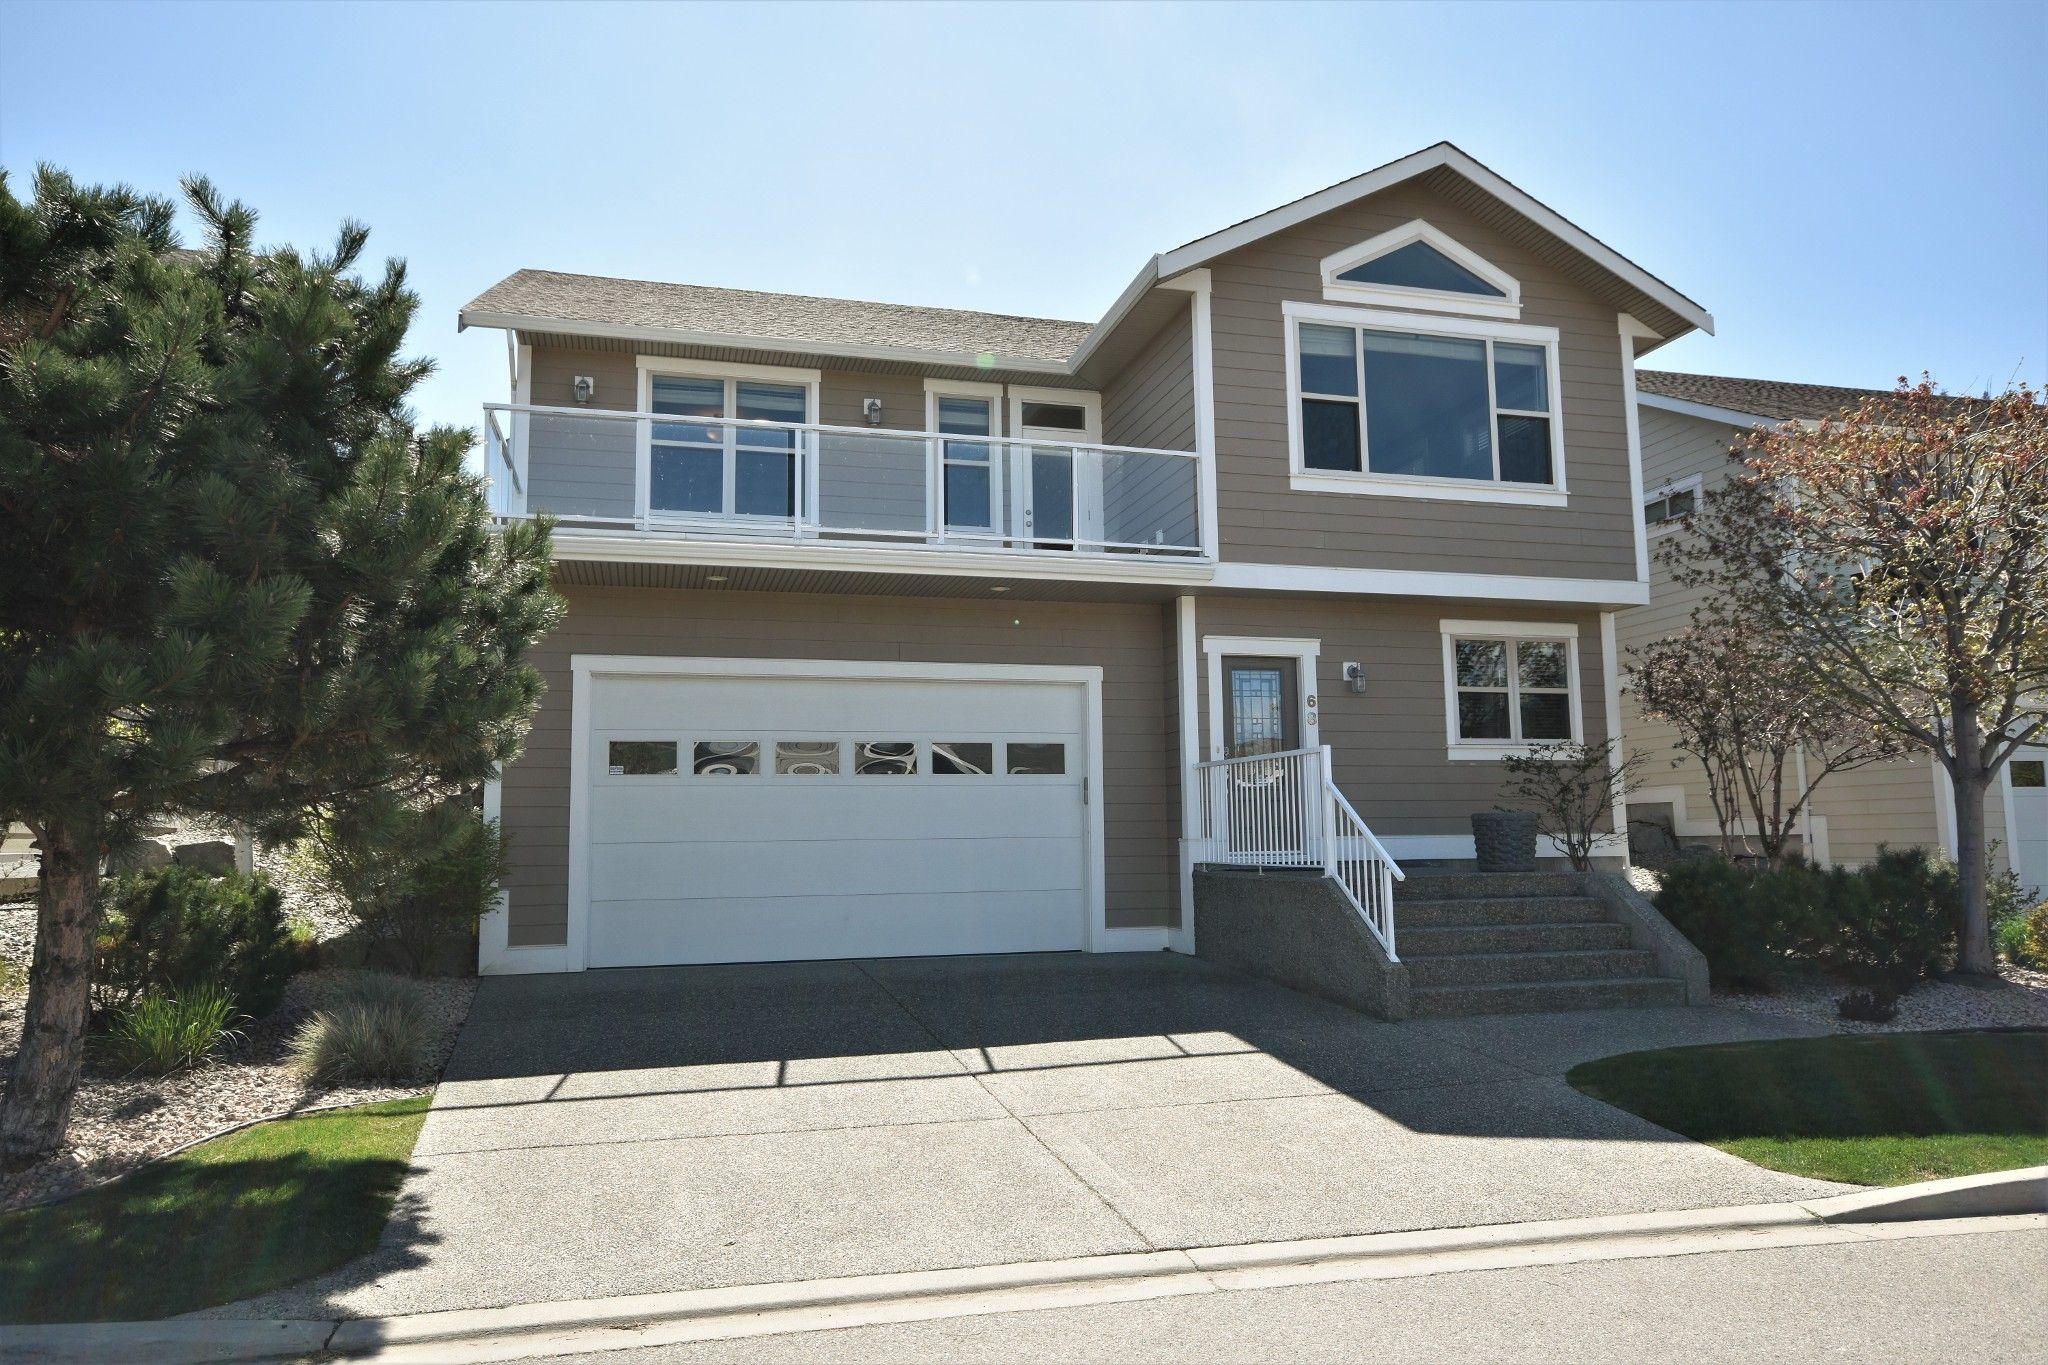 Main Photo: 68 7760 Okanagan Landing Road in Vernon: Okanagan Landing House for sale (North Okanagan)  : MLS®# 10204323